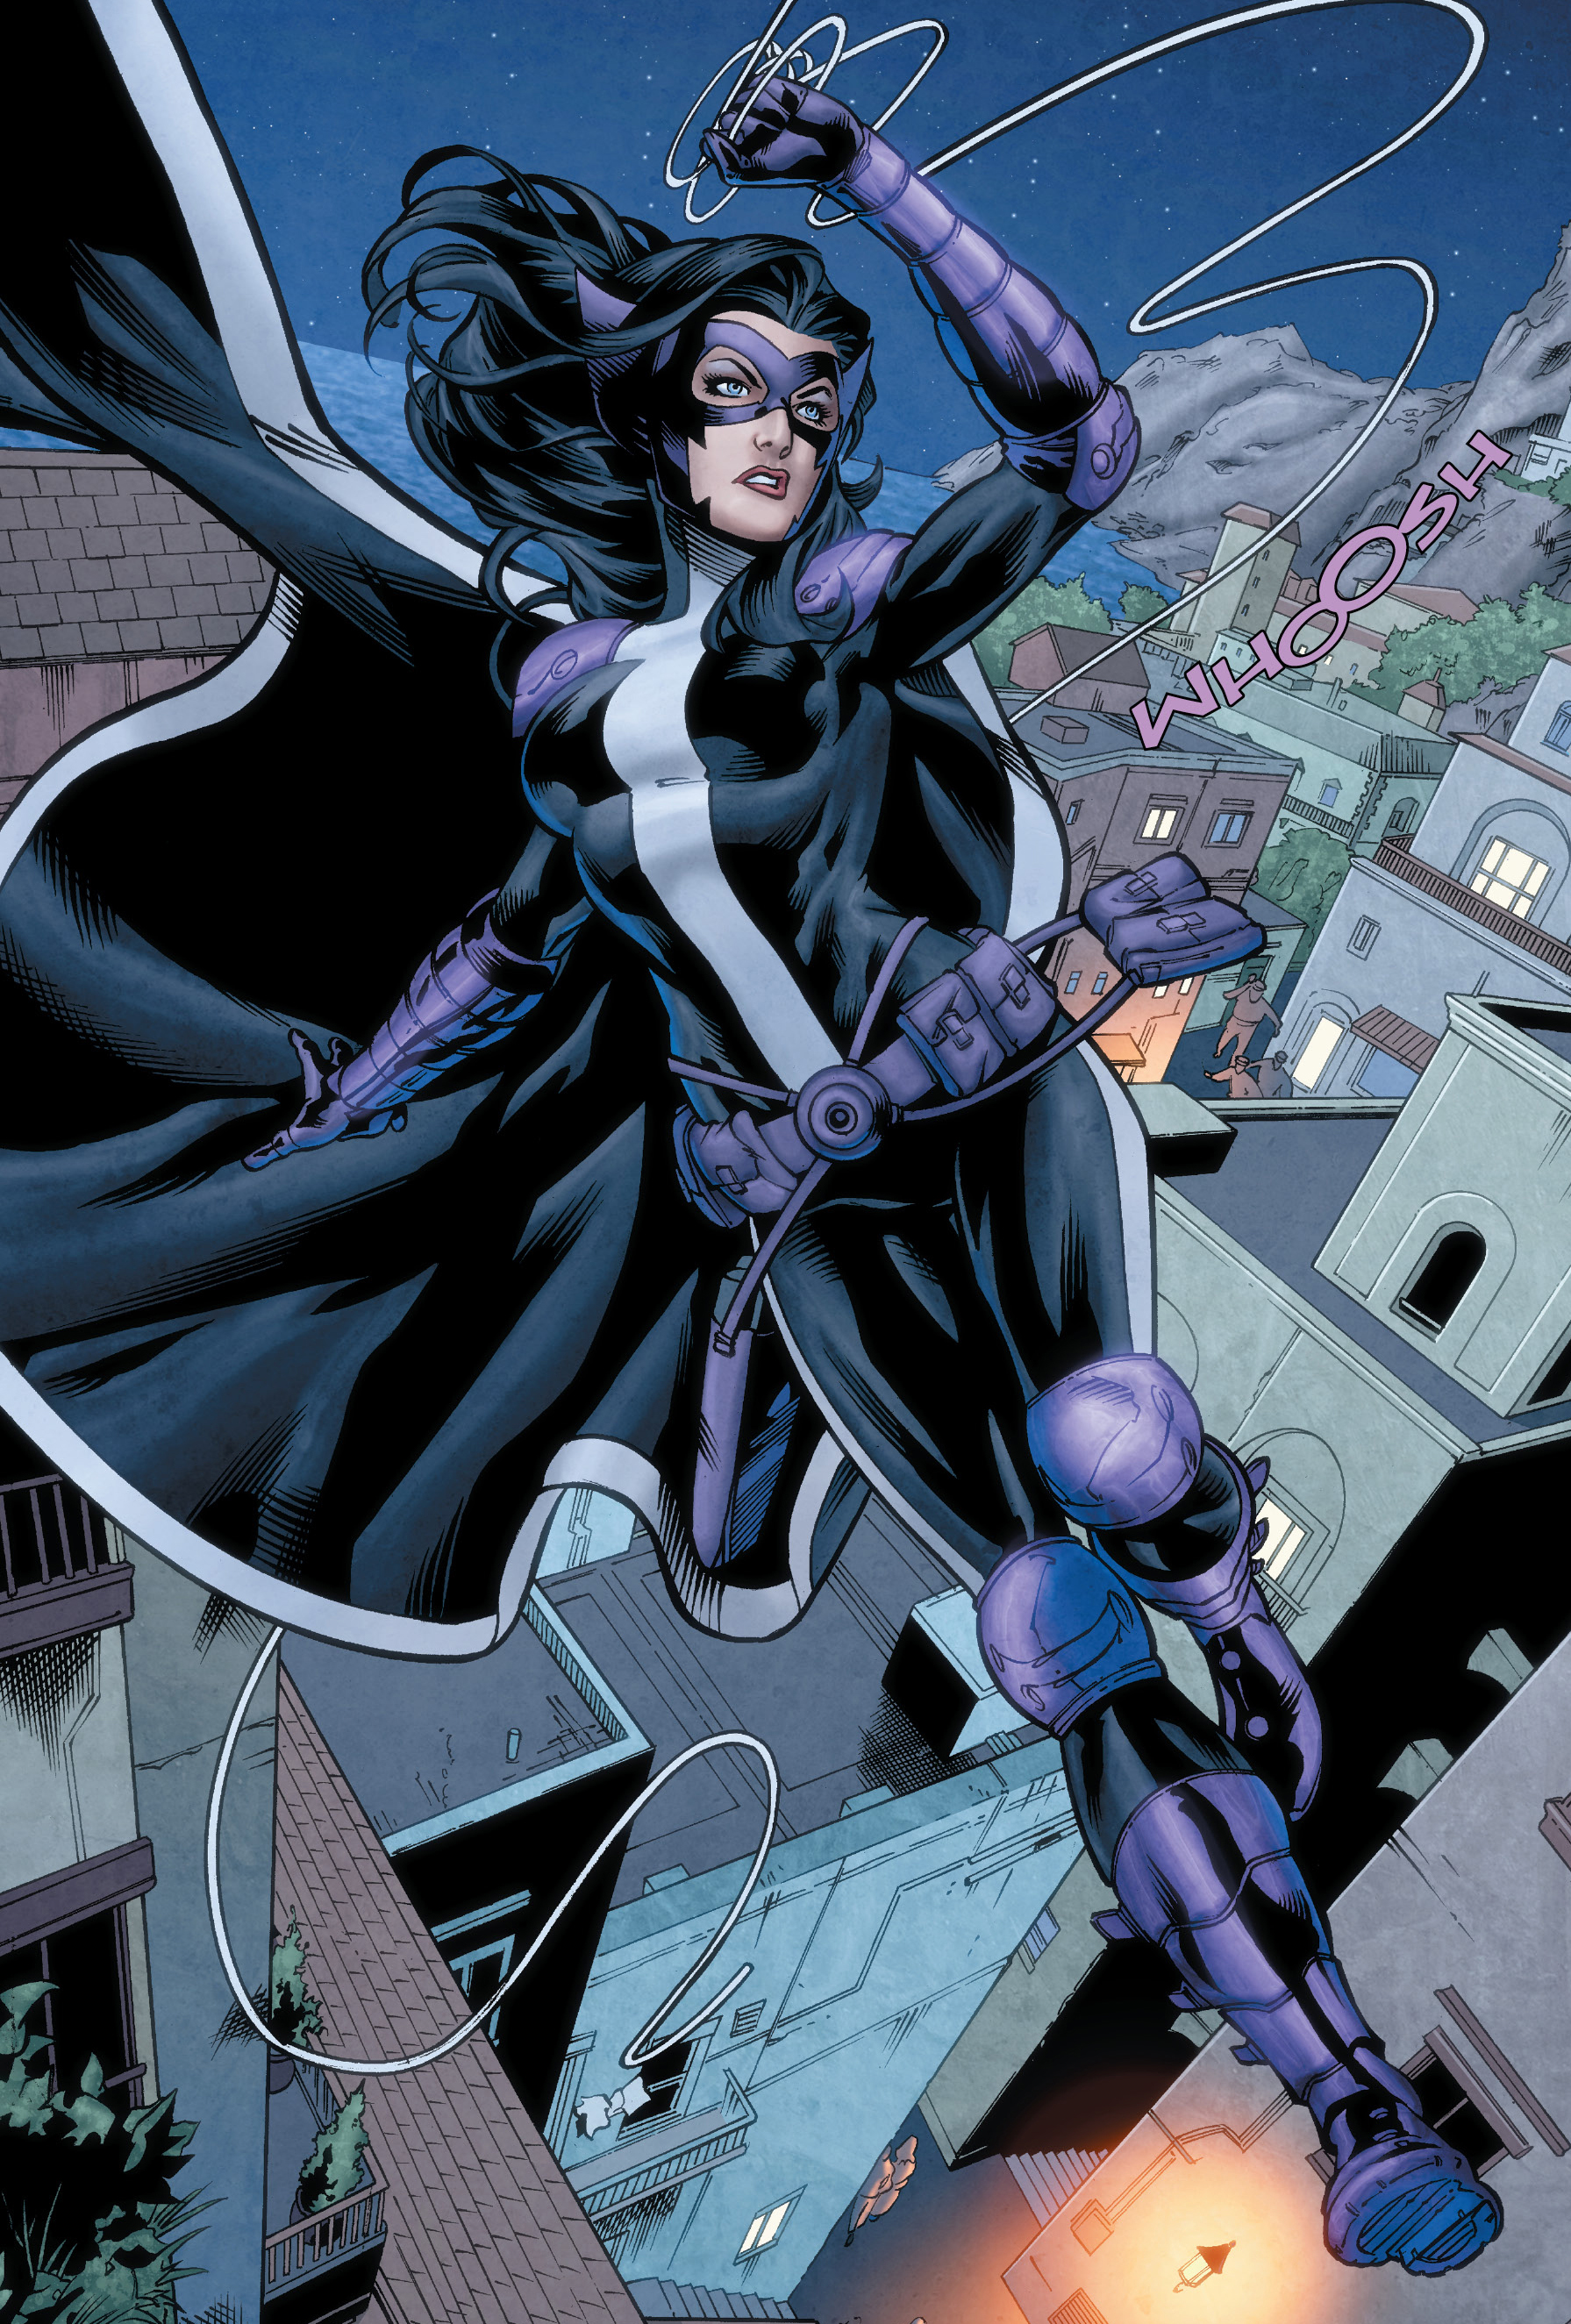 Huntress (Wayne) screenshots, images and pictures - Comic Vine